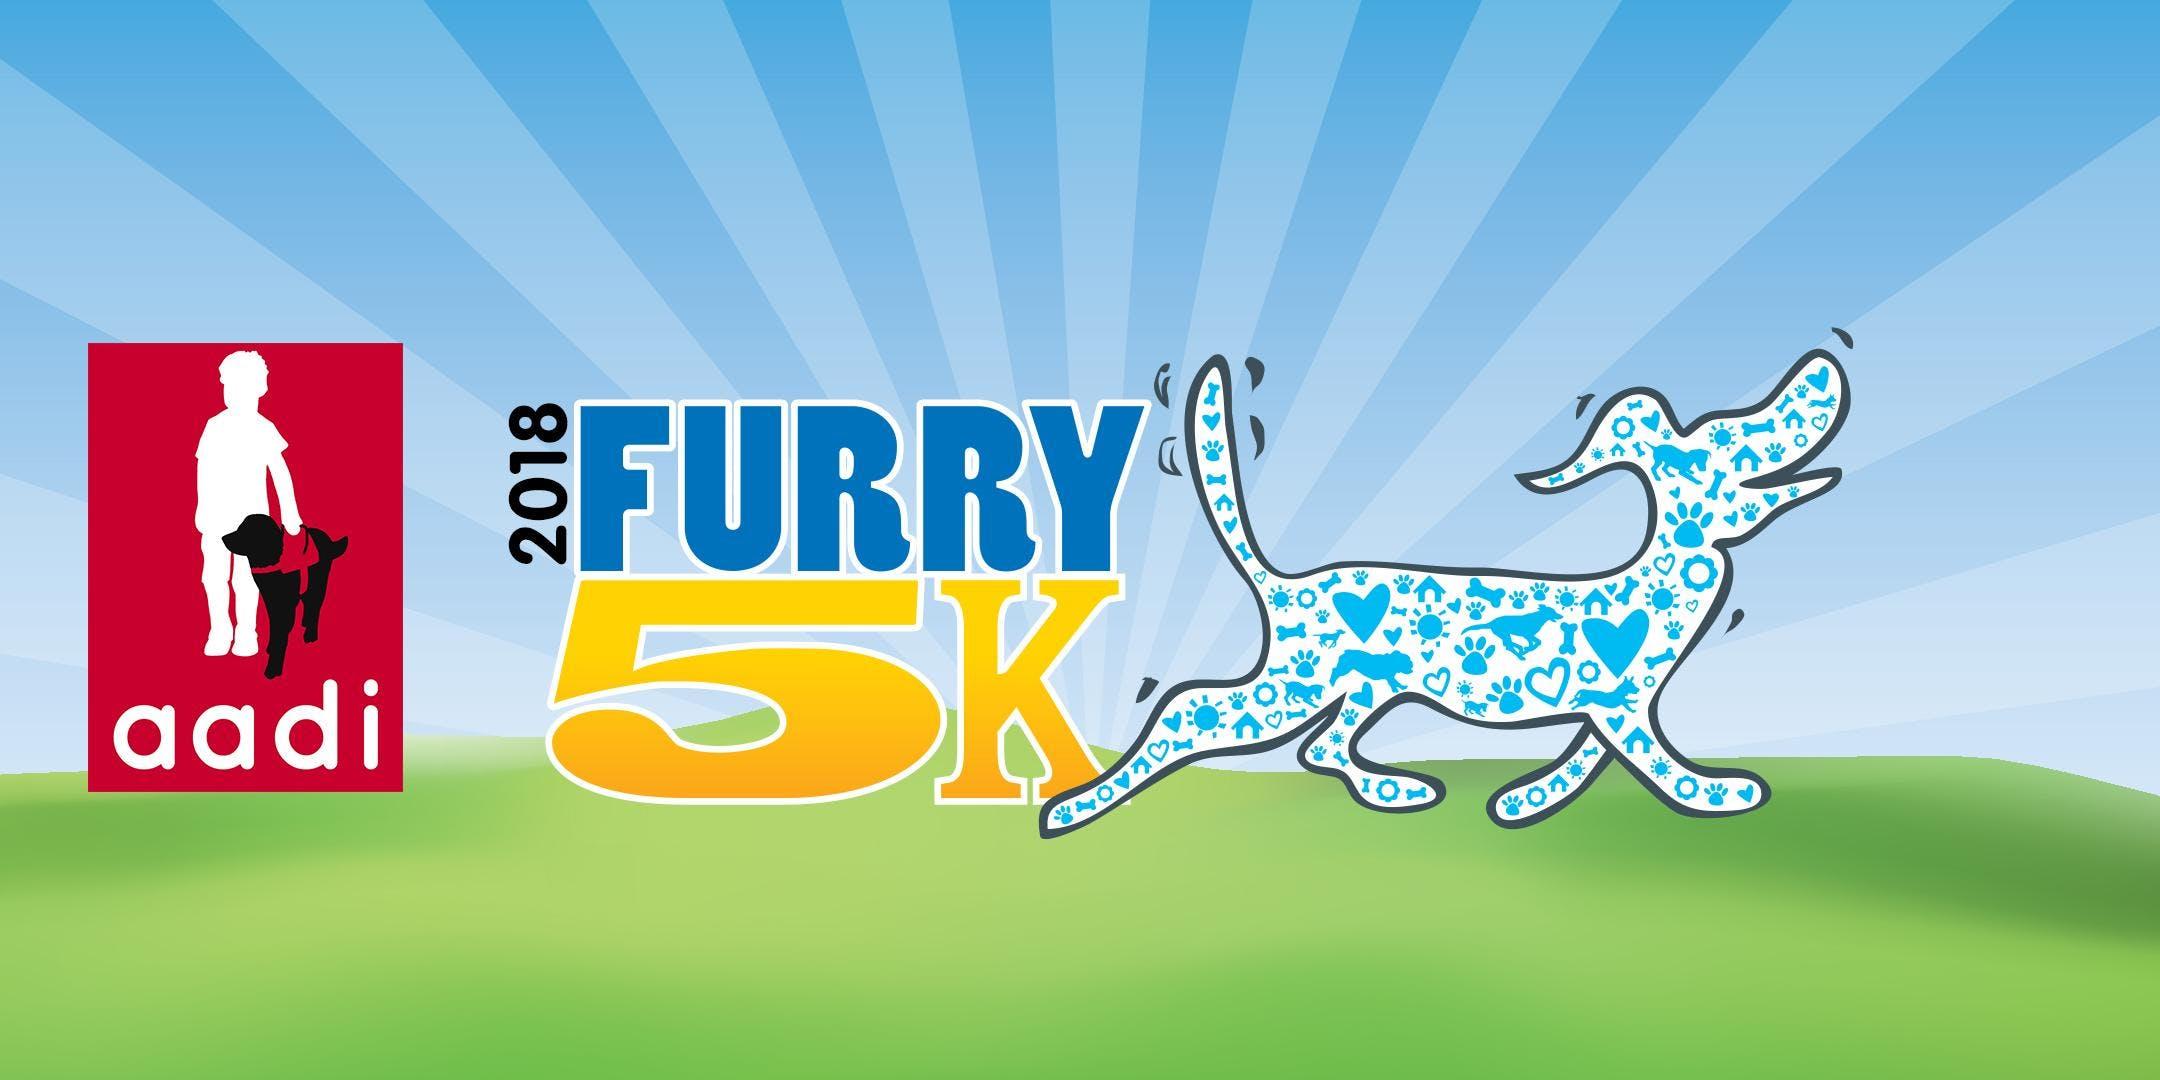 Petworld Portlaoise Furry 5k Annual Sponsored Dog Walk 2018